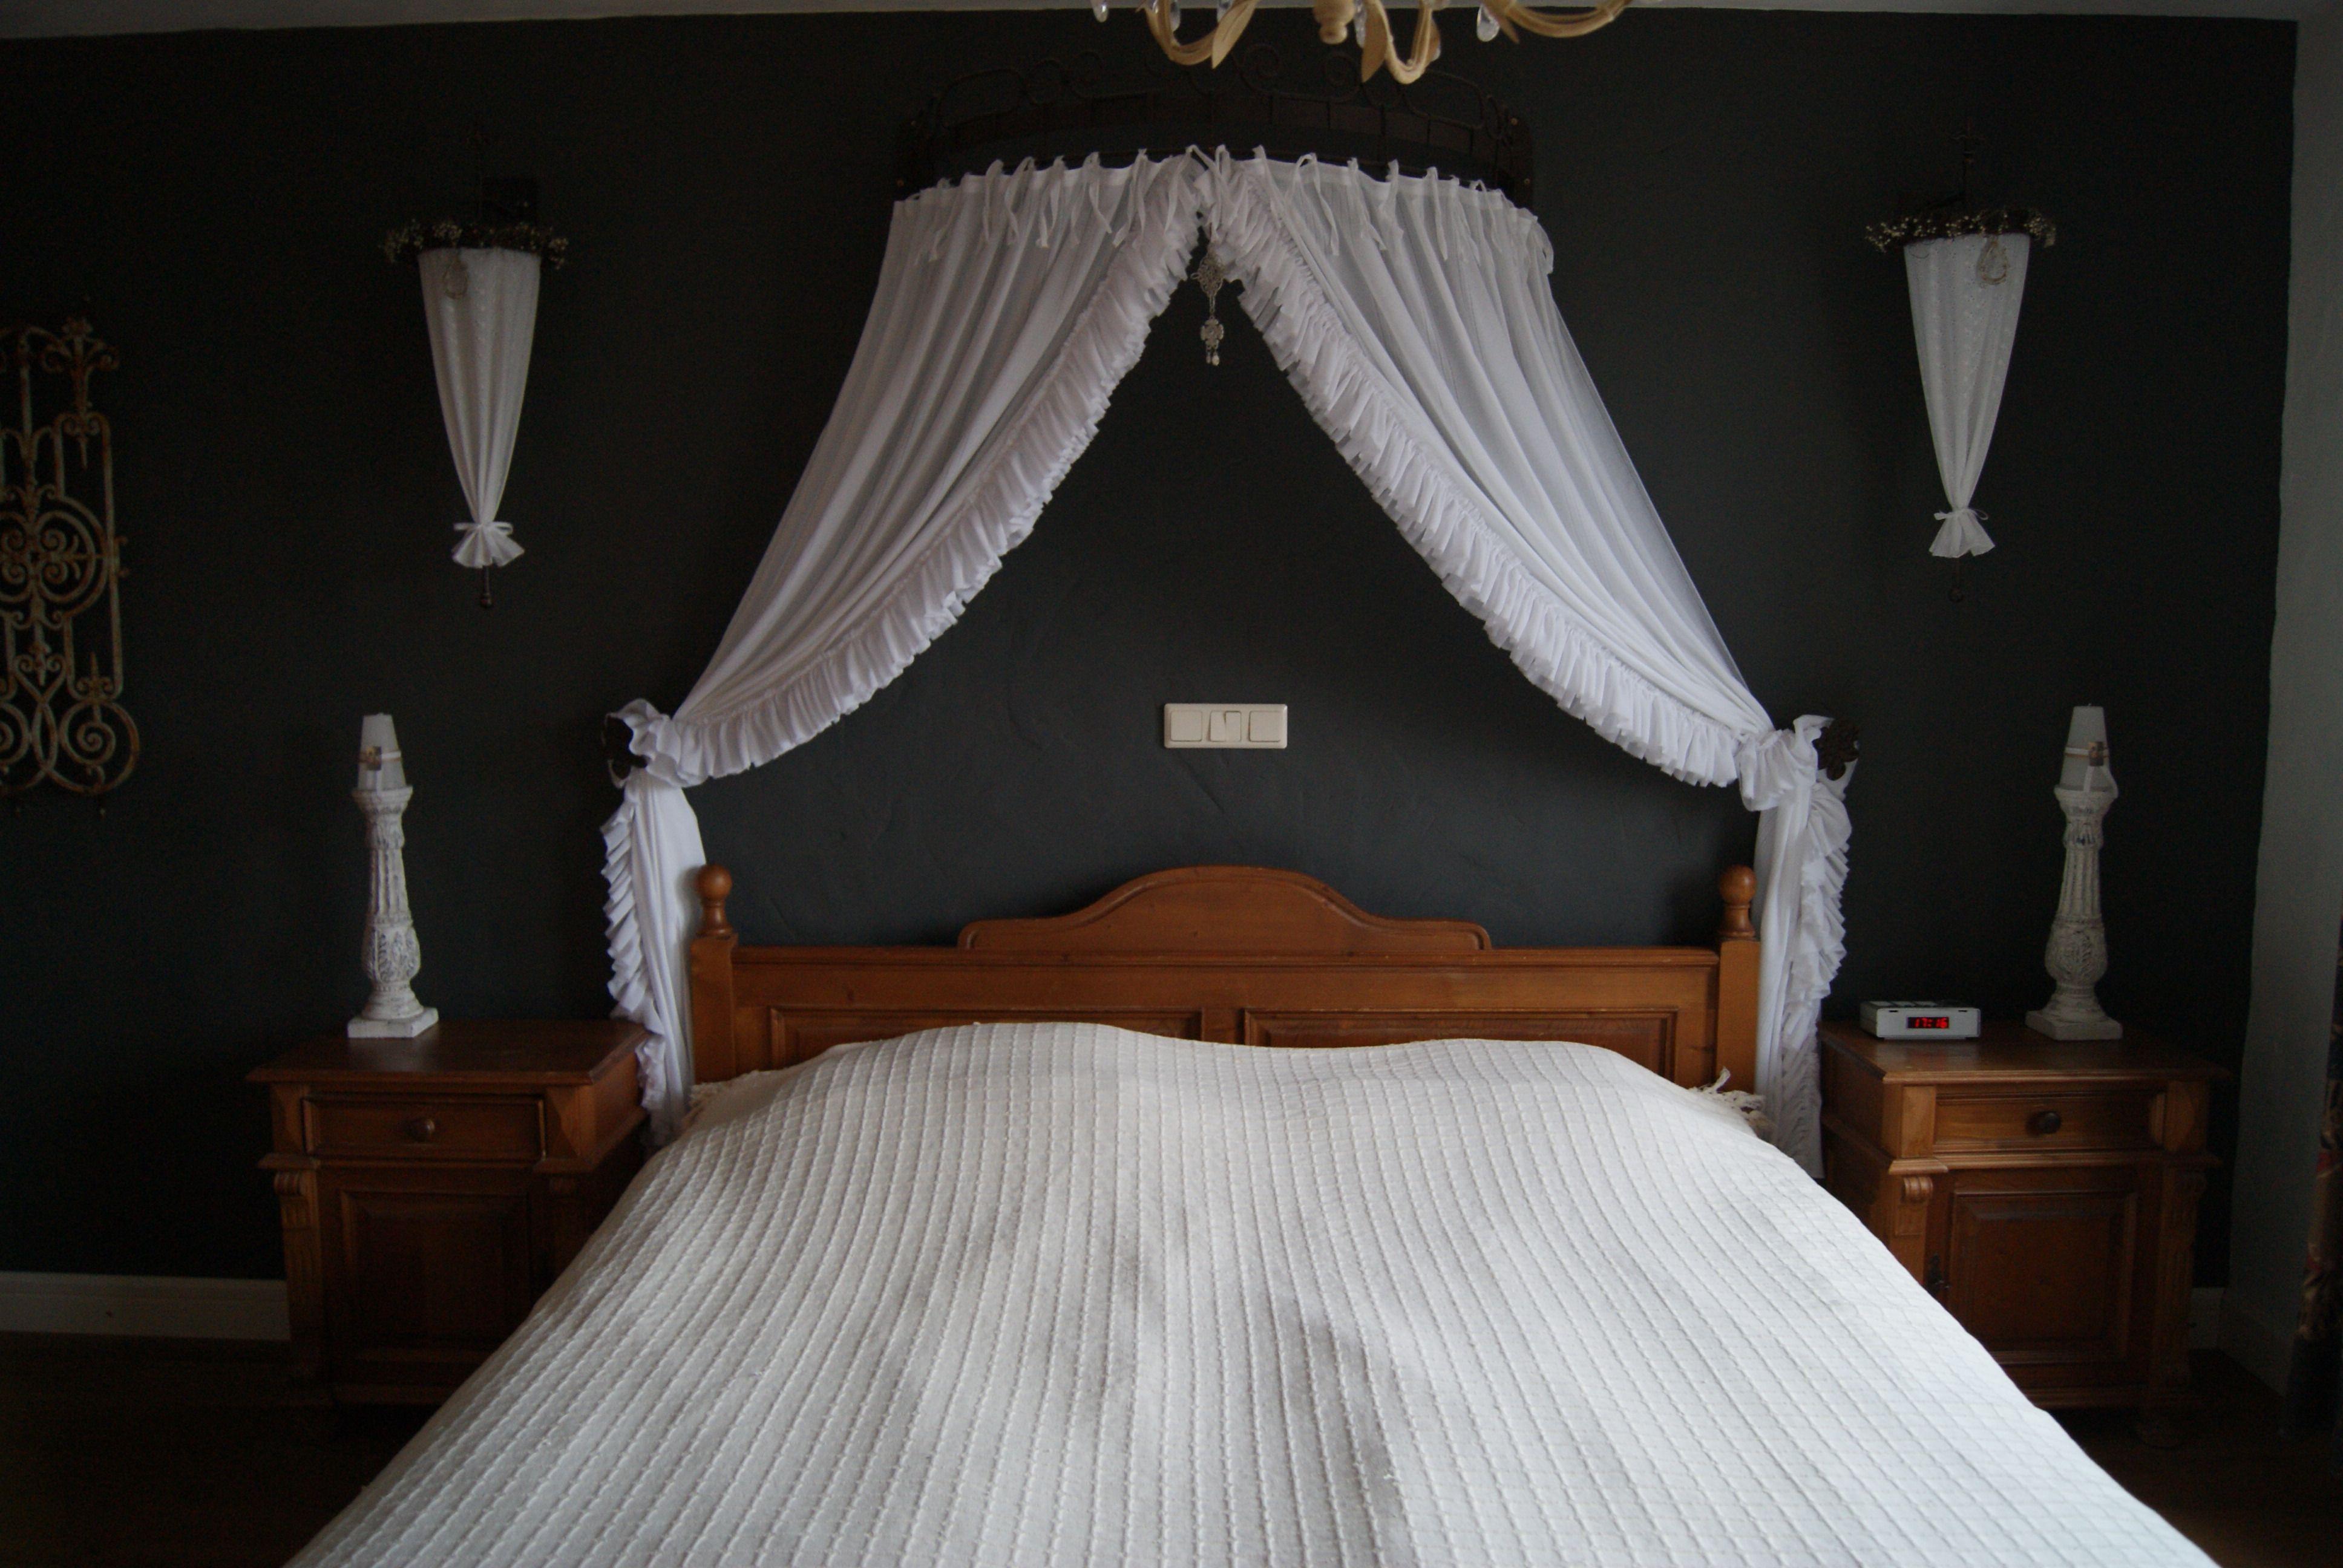 Hemelbed onze slaapkamer stage design and room